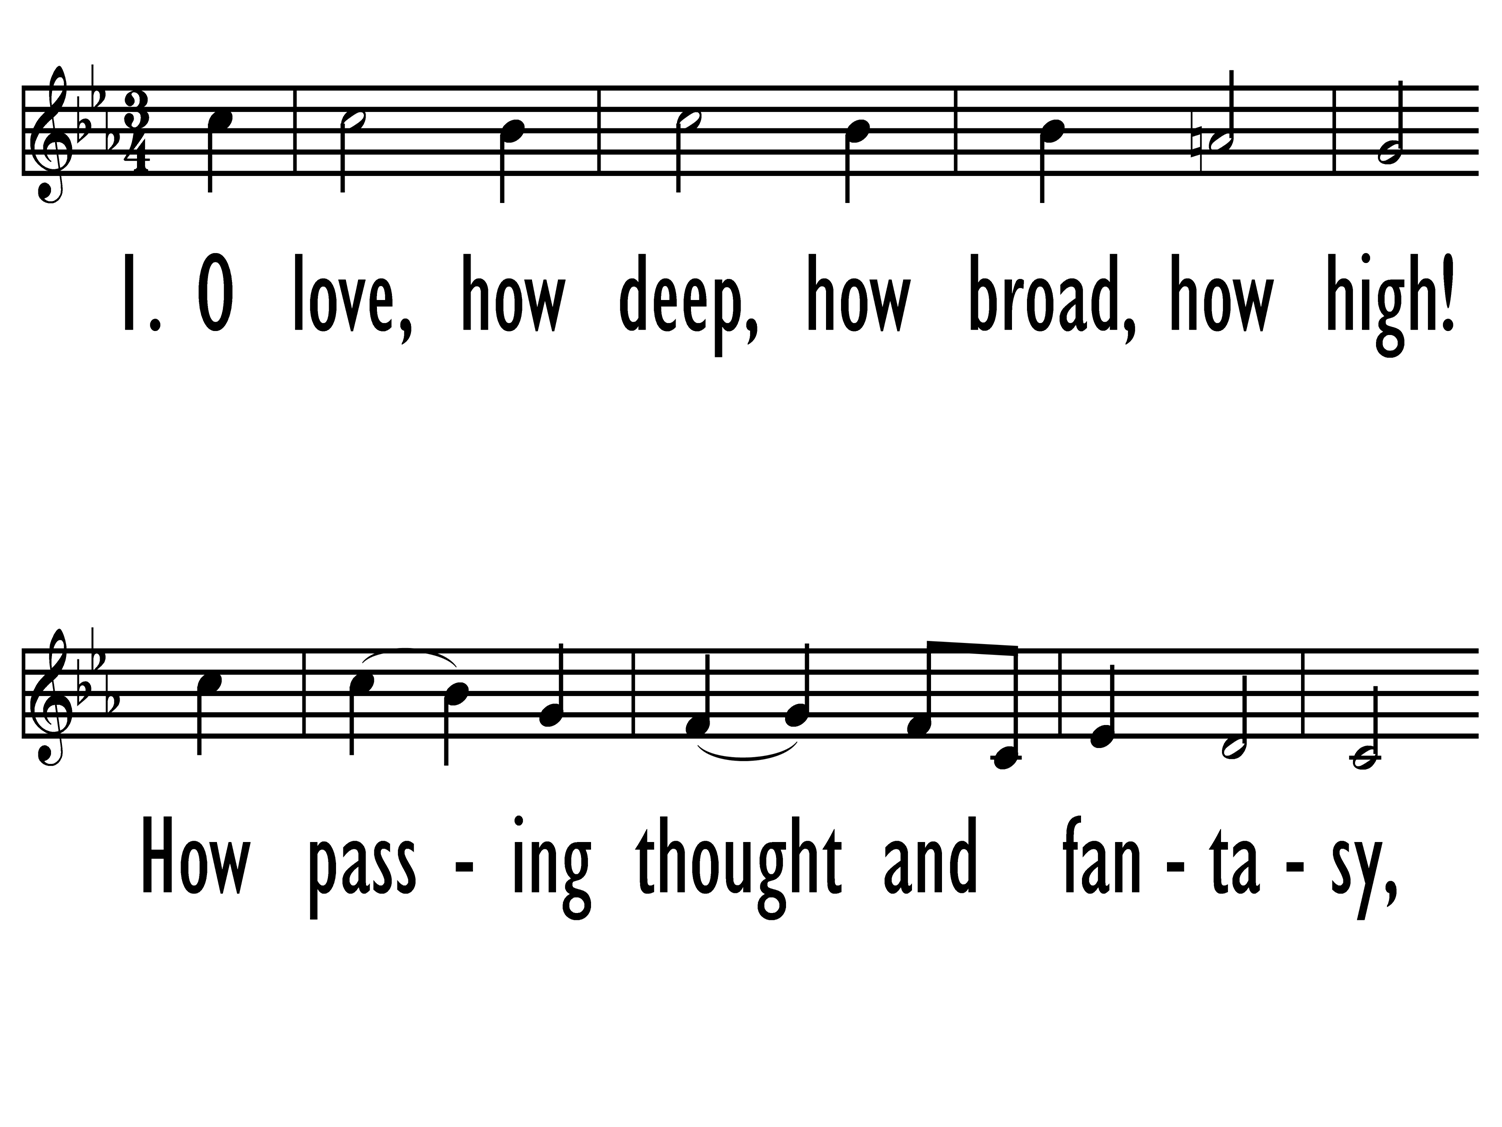 O LOVE, HOW DEEP, HOW BROAD, HOW HIGH! - Lead Line-ppt